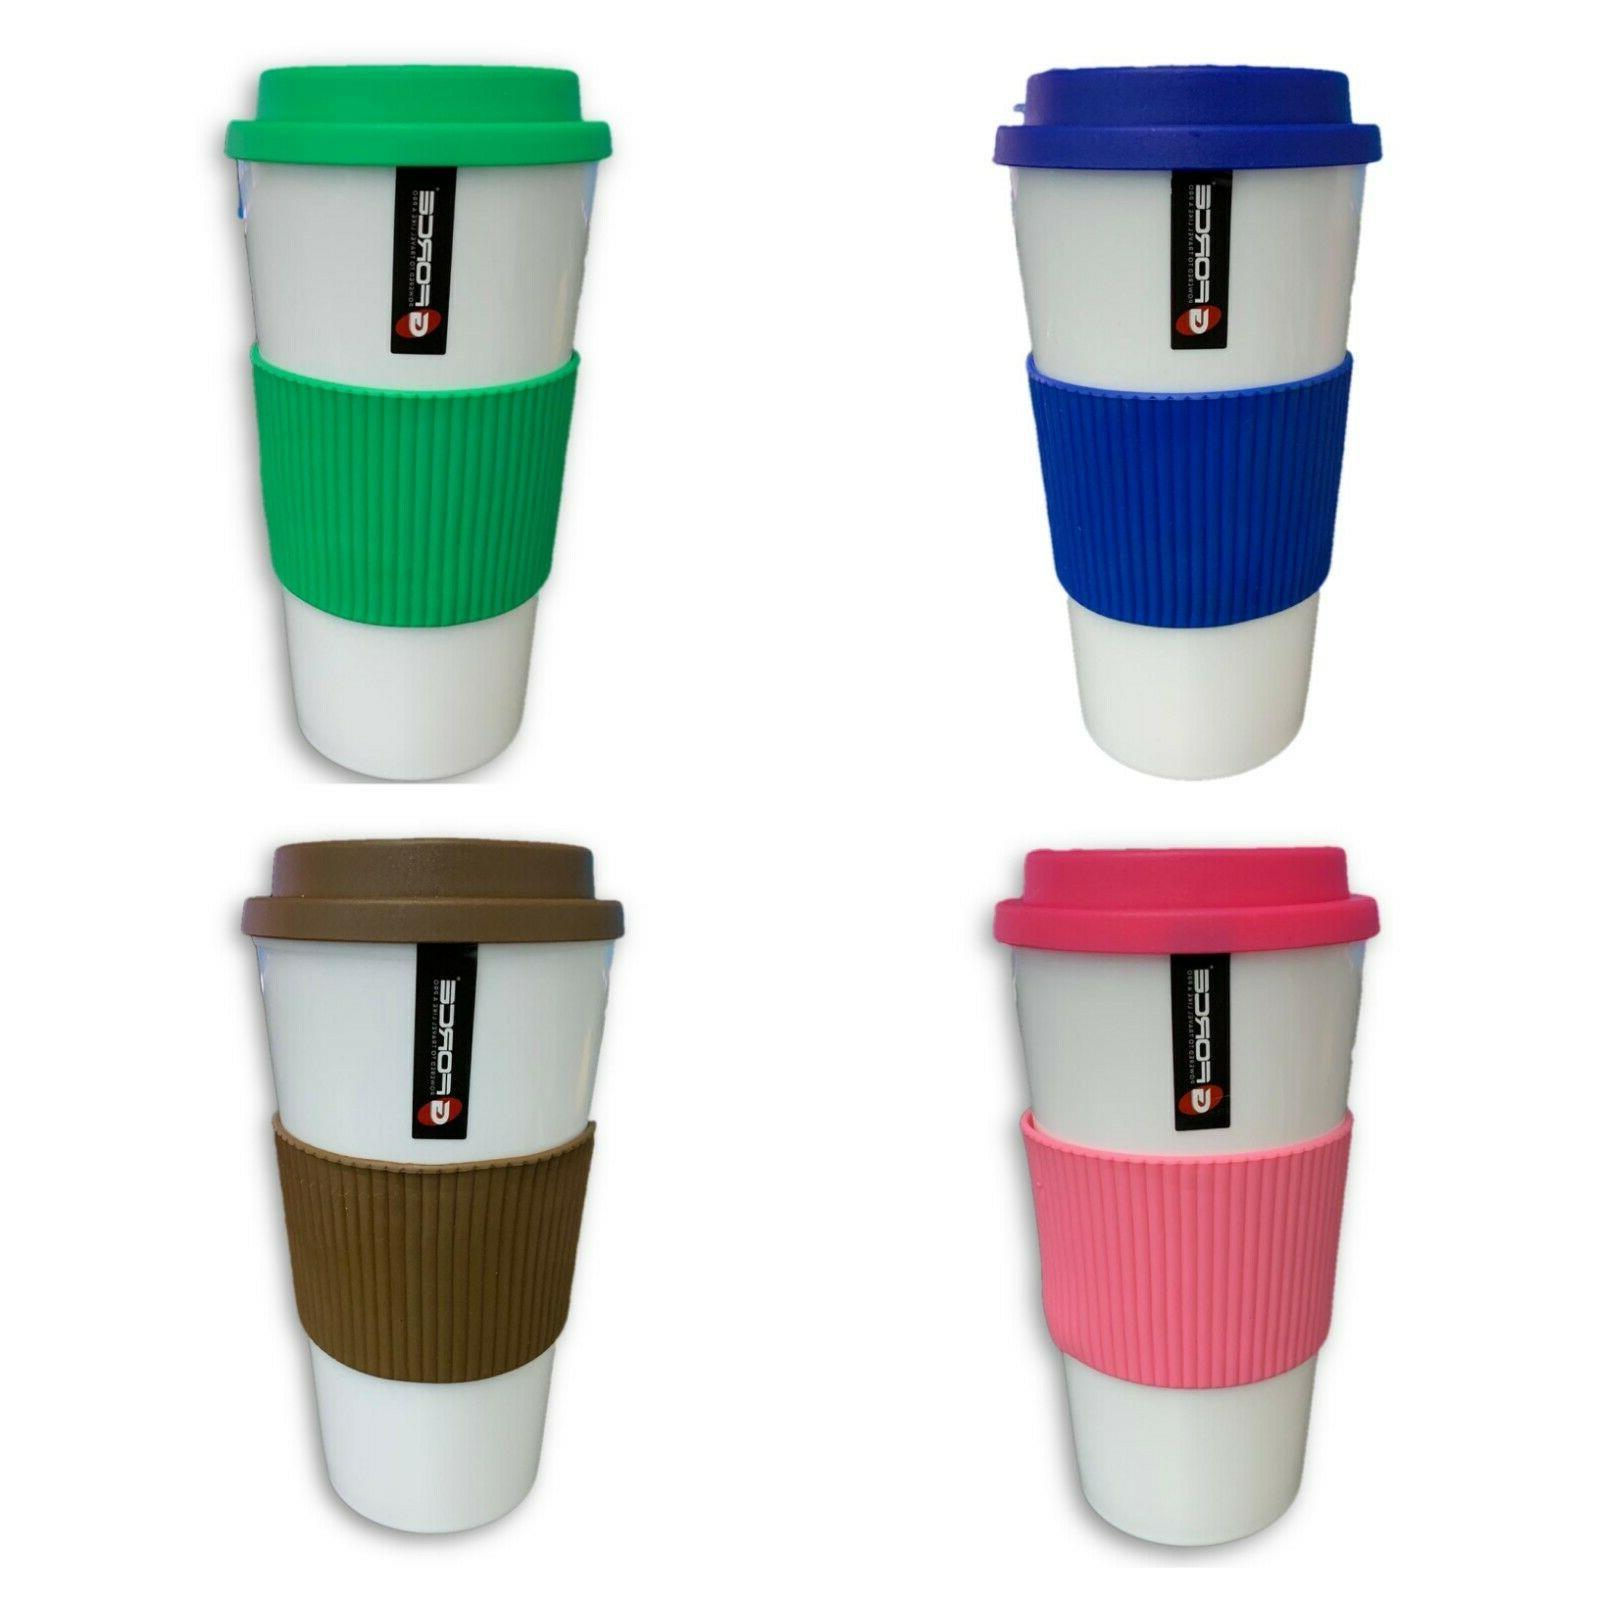 16oz double wall insulated travel mug coffee